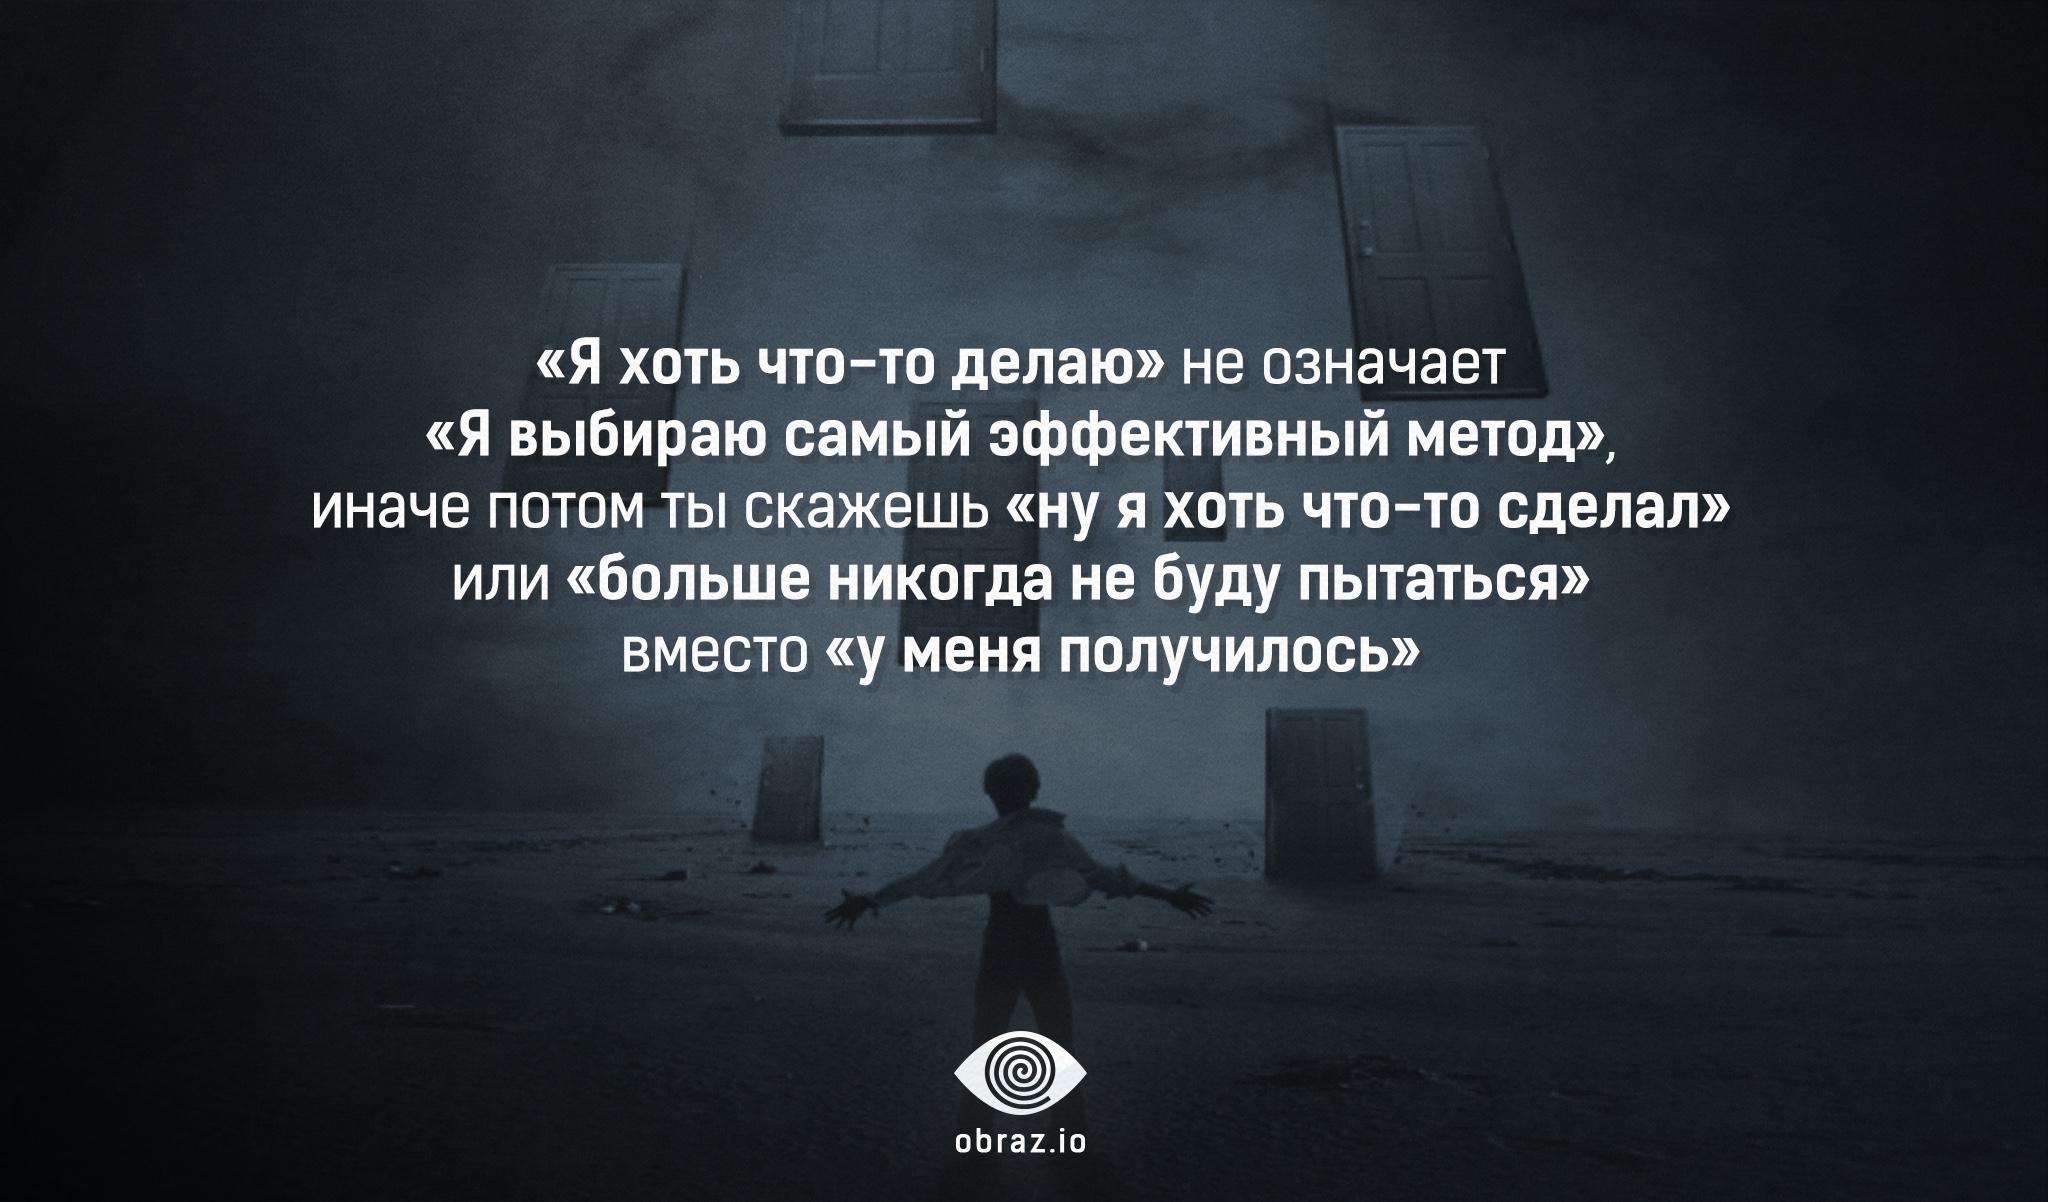 Email:learningkurakov@gmail com3292 2g7mcn.40t62mx6r